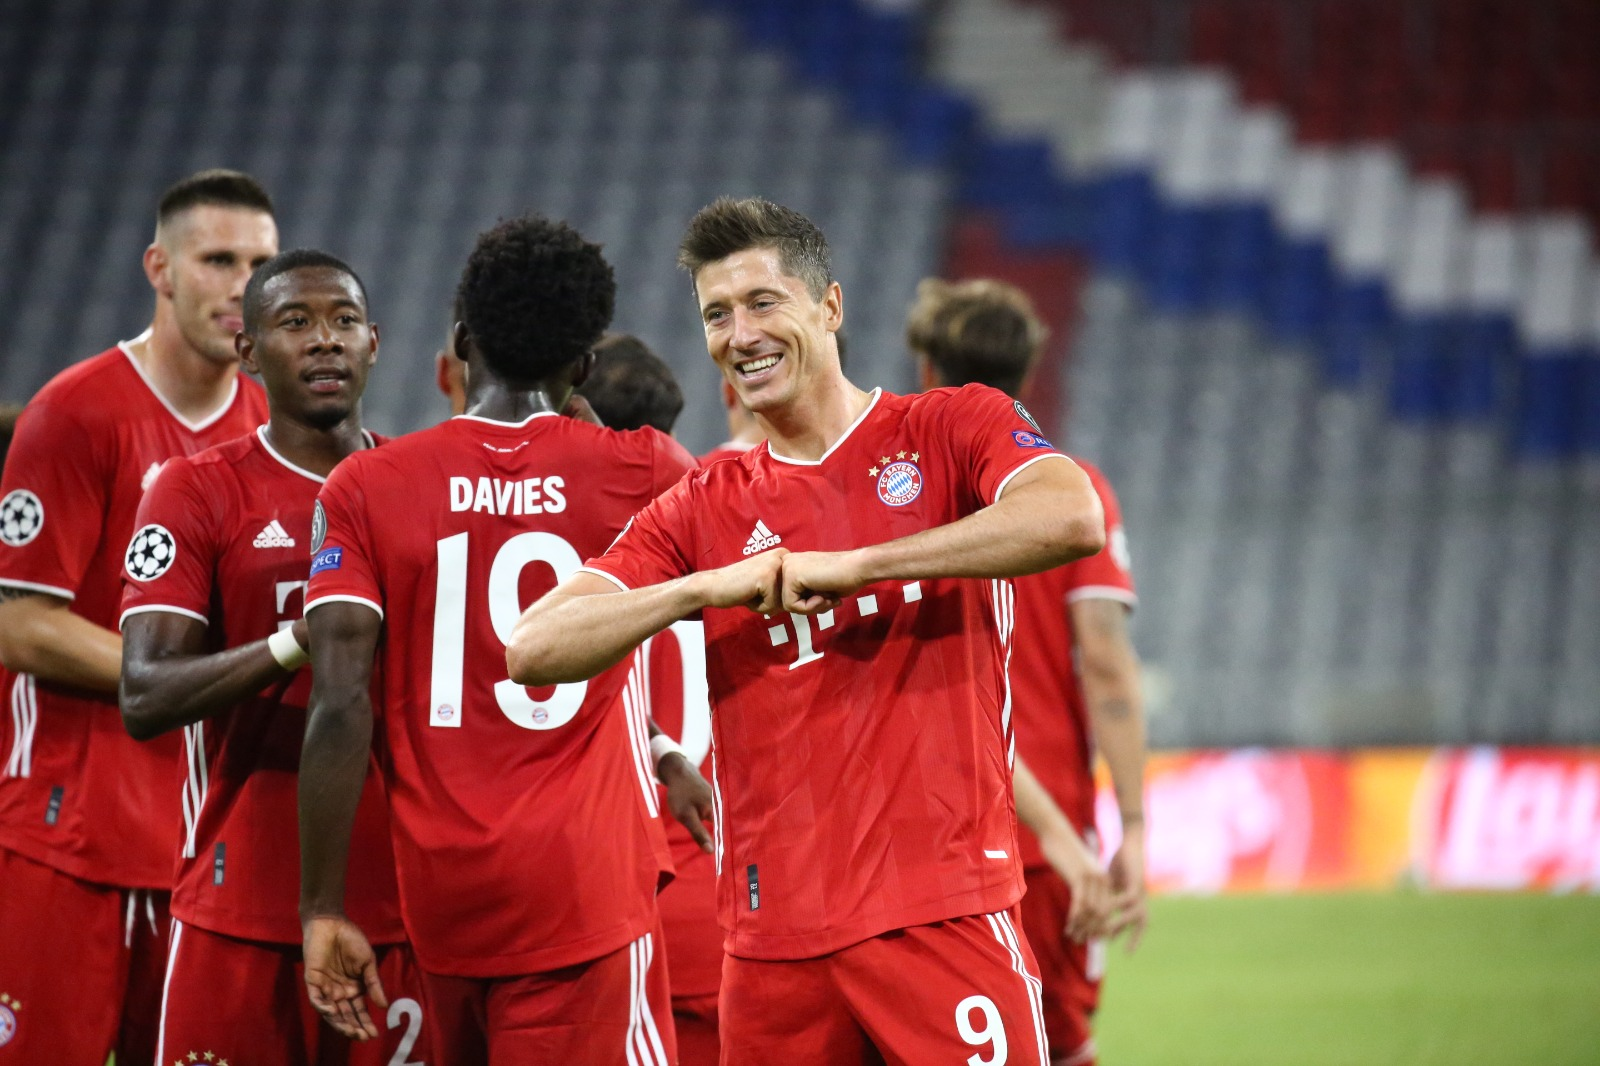 Lewandowski: 'Ronaldo's Champions League Goal Record Not My Target'